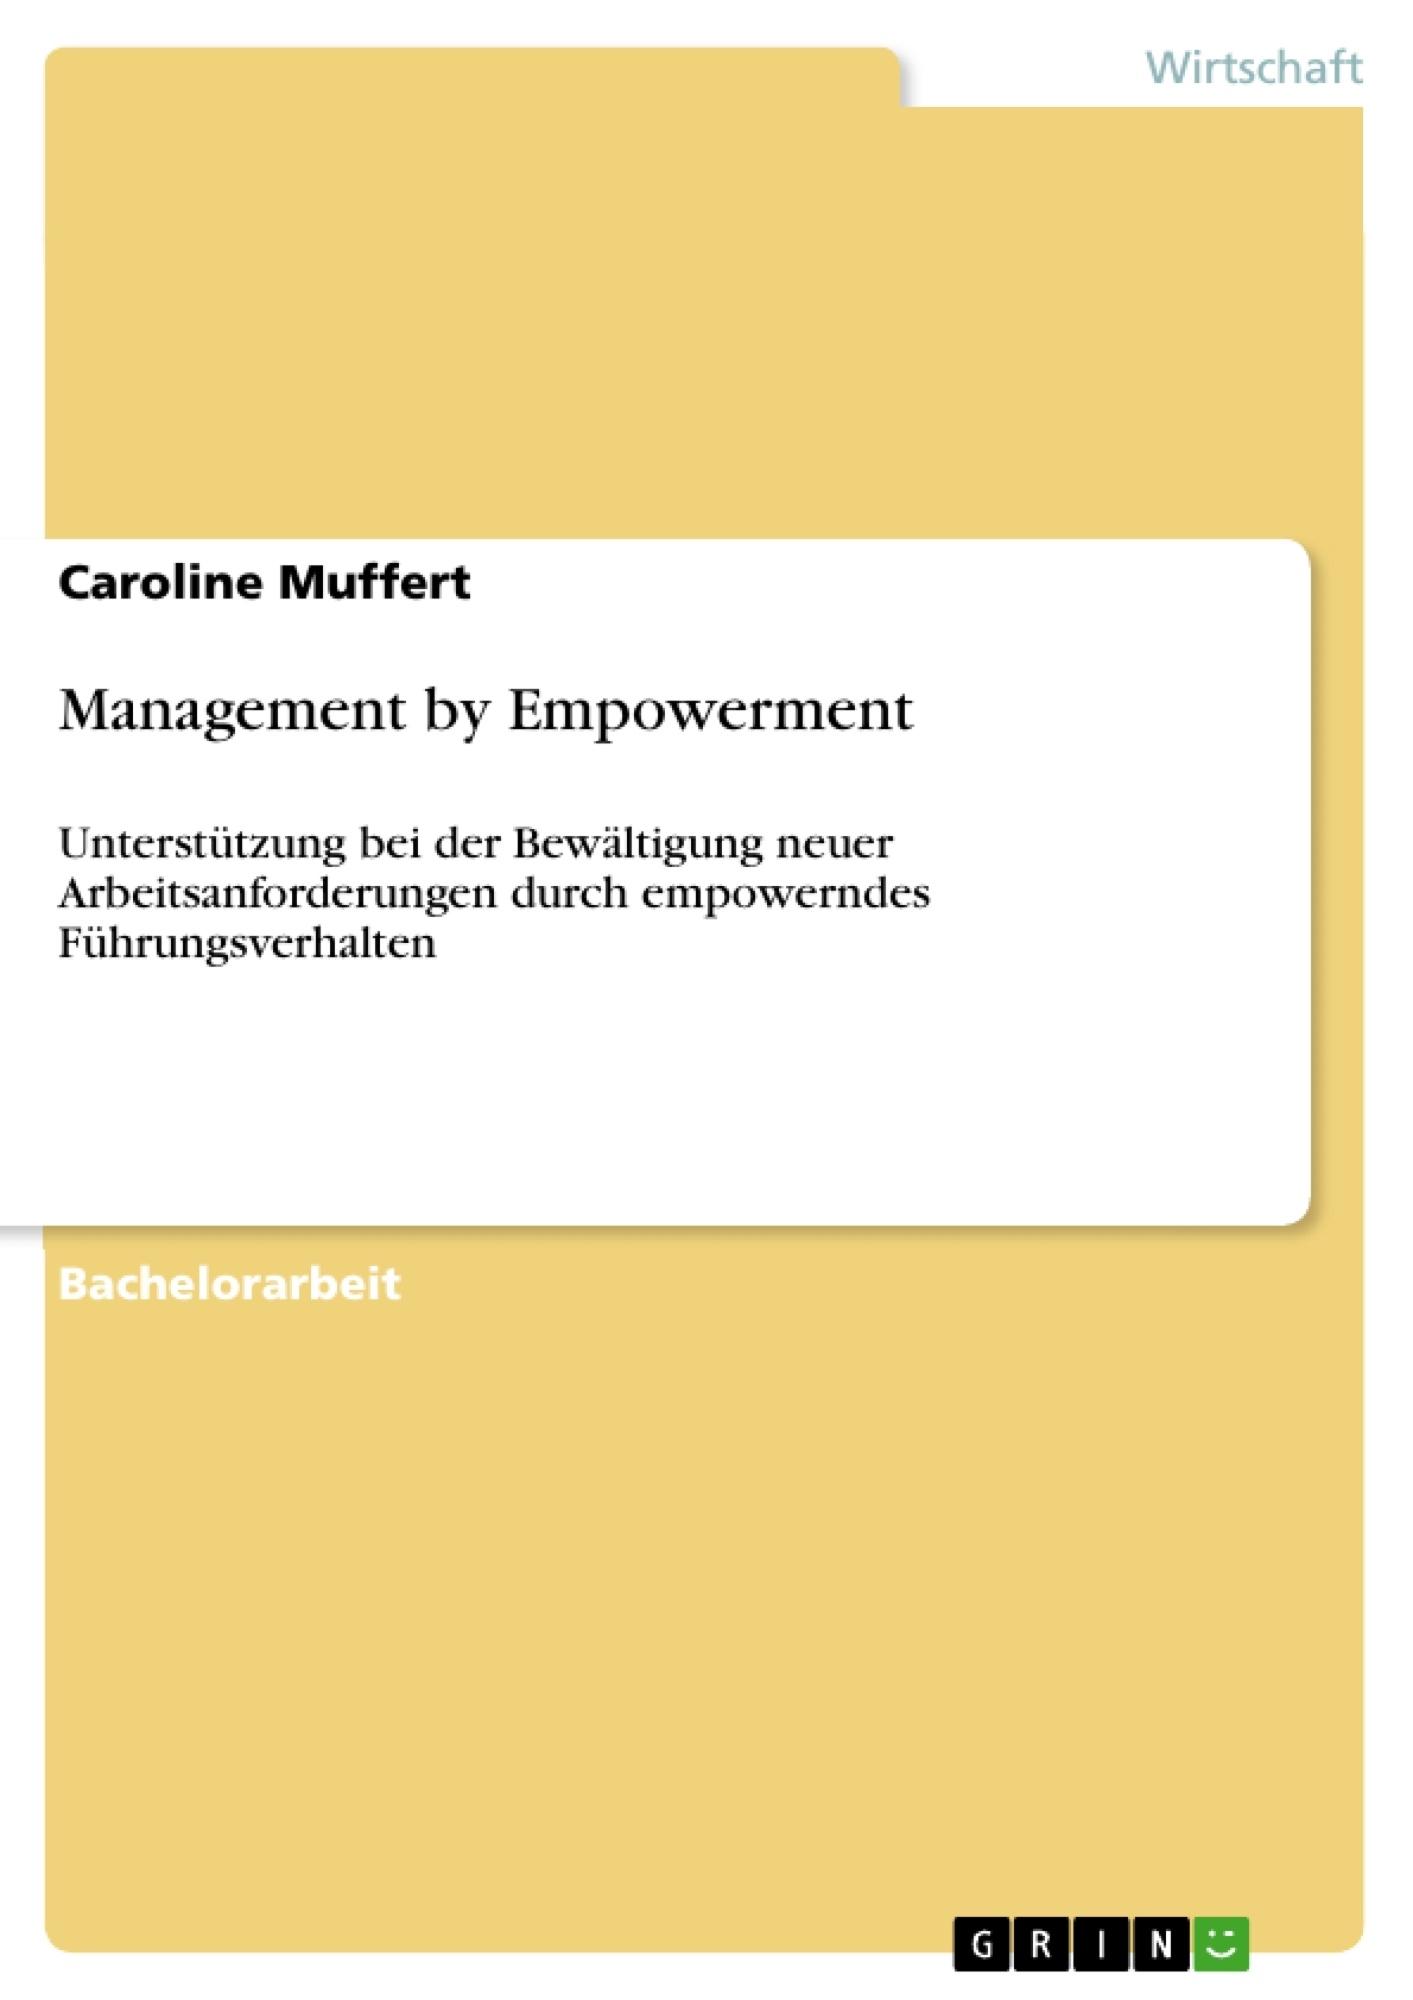 Titel: Management by Empowerment